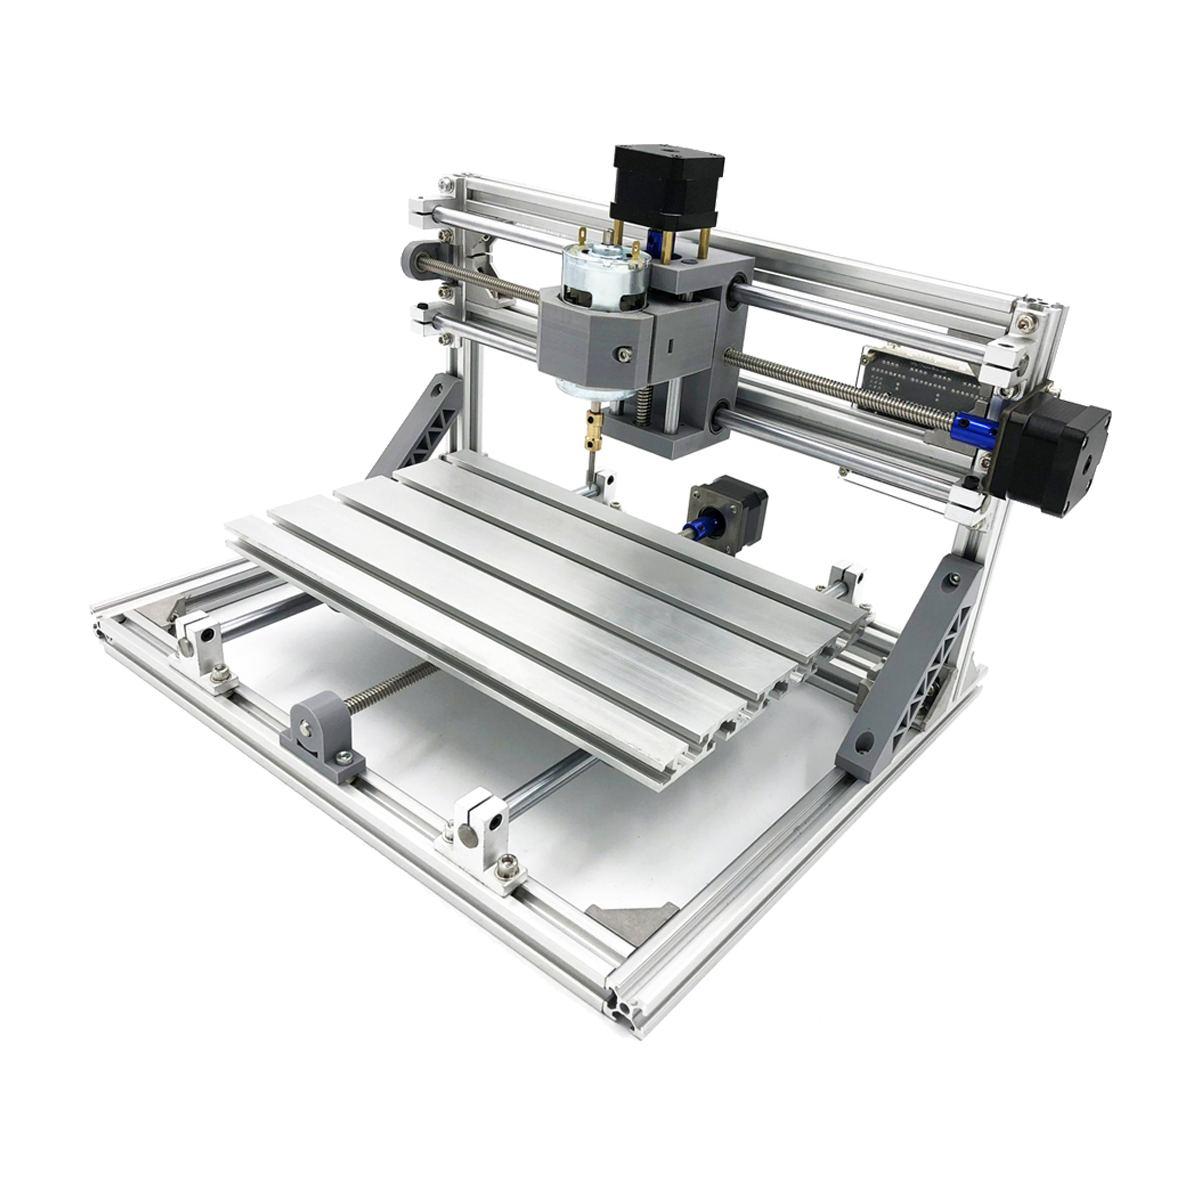 Mini 3 Lasergravure Graveur Machine DC 12V DIY Desktop Hout Cutter/Printer/Power Verstelbare Met 500MW Laser Hoofd - 5